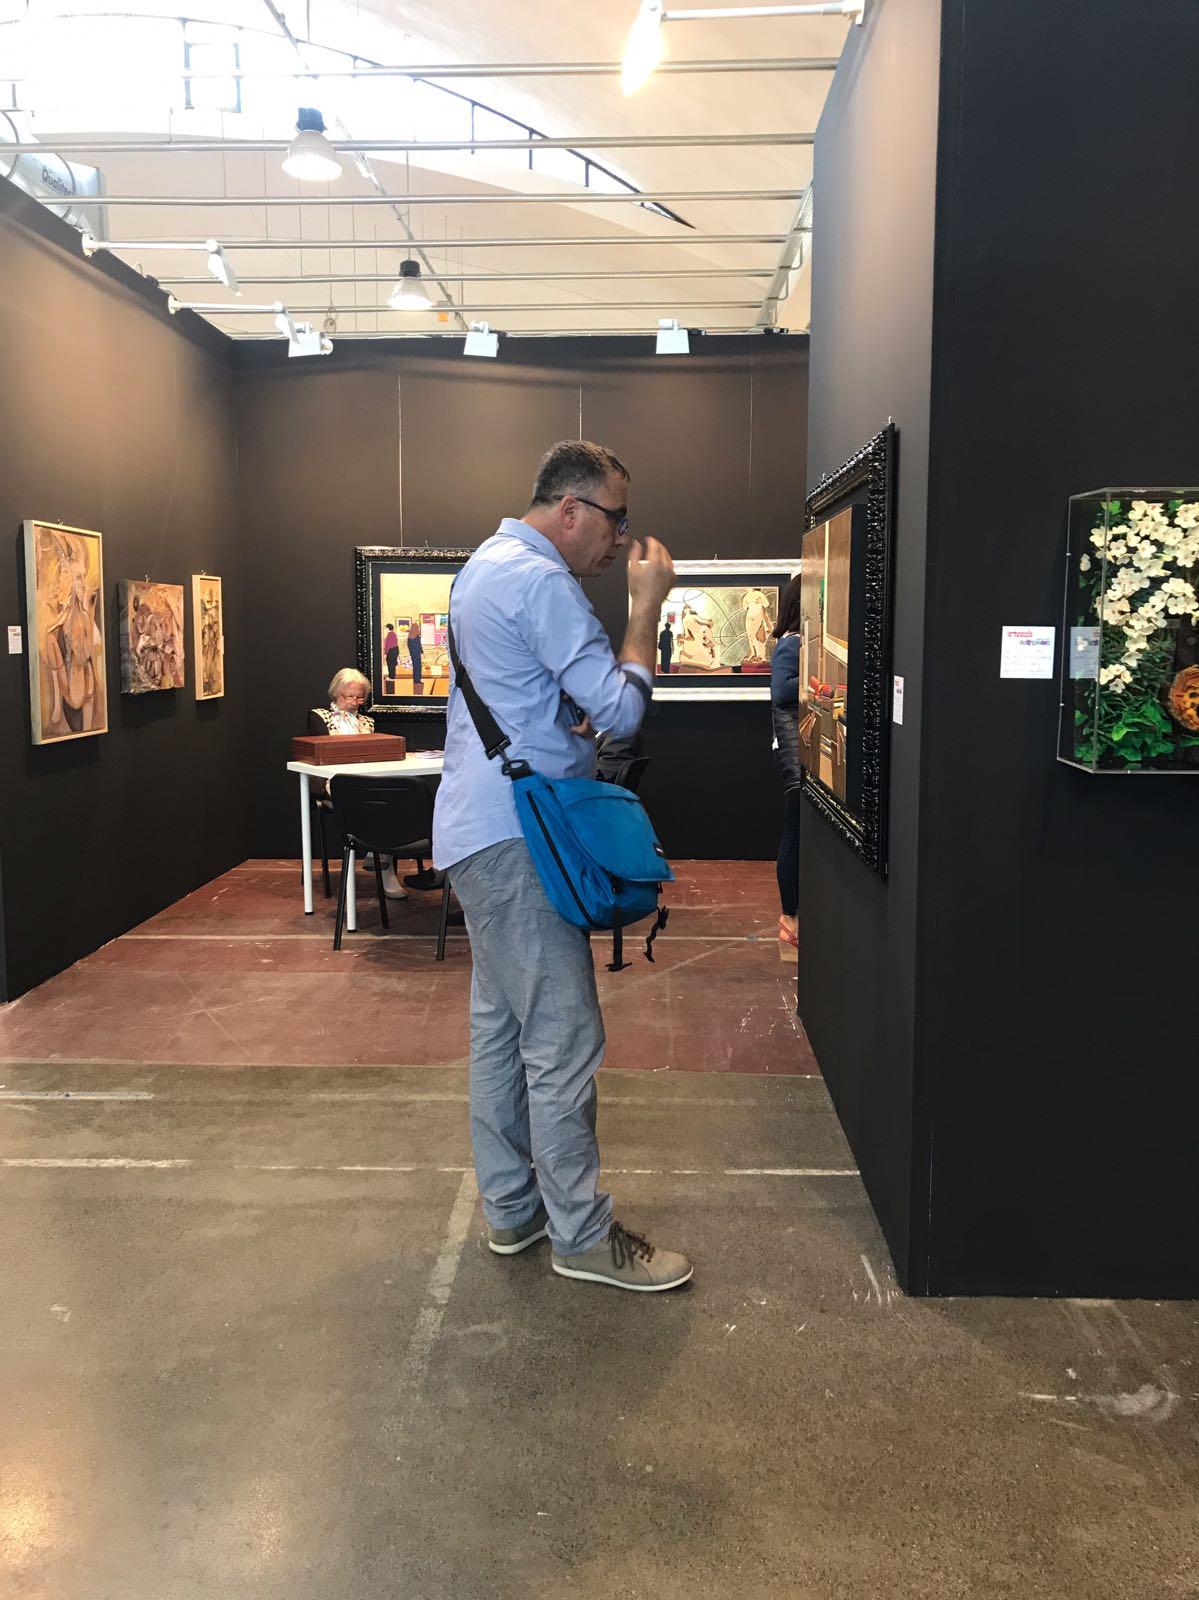 art luca 2018 la telaccia.JPG